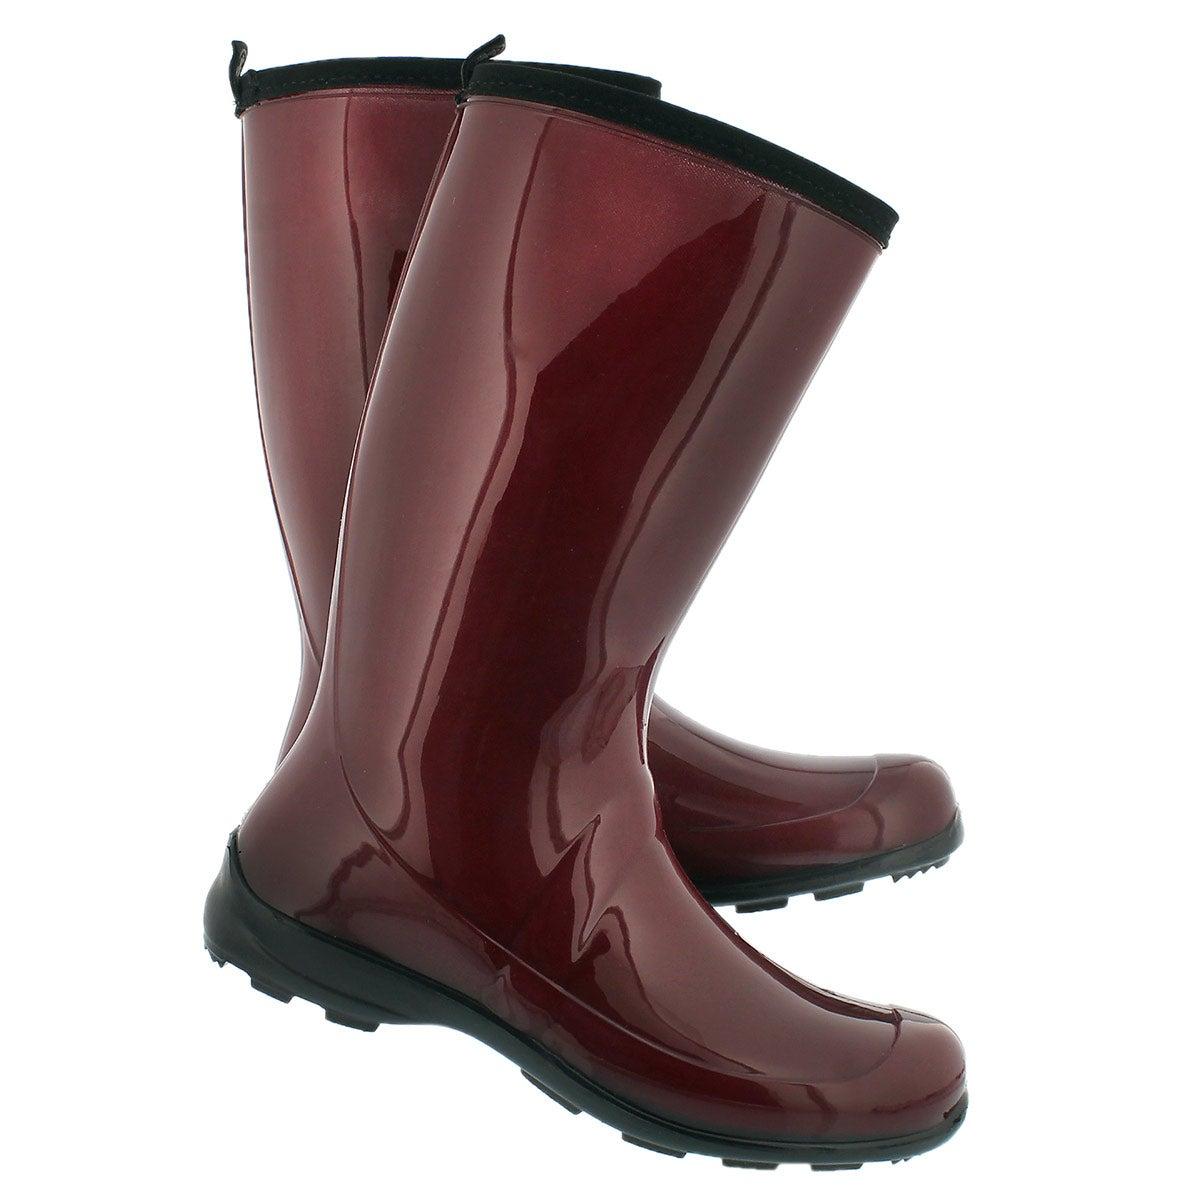 Women's HEIDI red mid waterproof rain boots